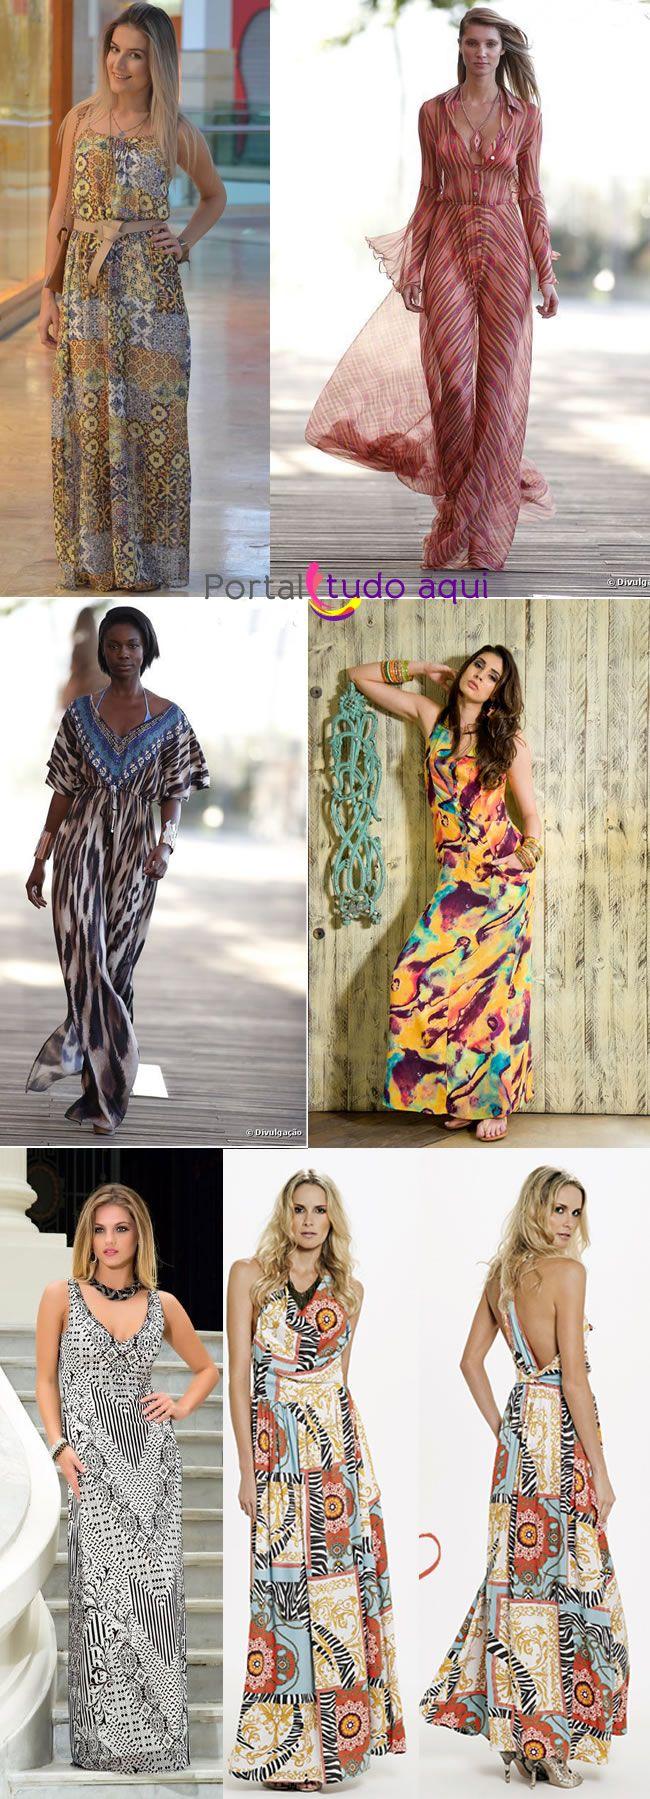 vestido-longo-estampa-geometrica-primavera-verao-2014